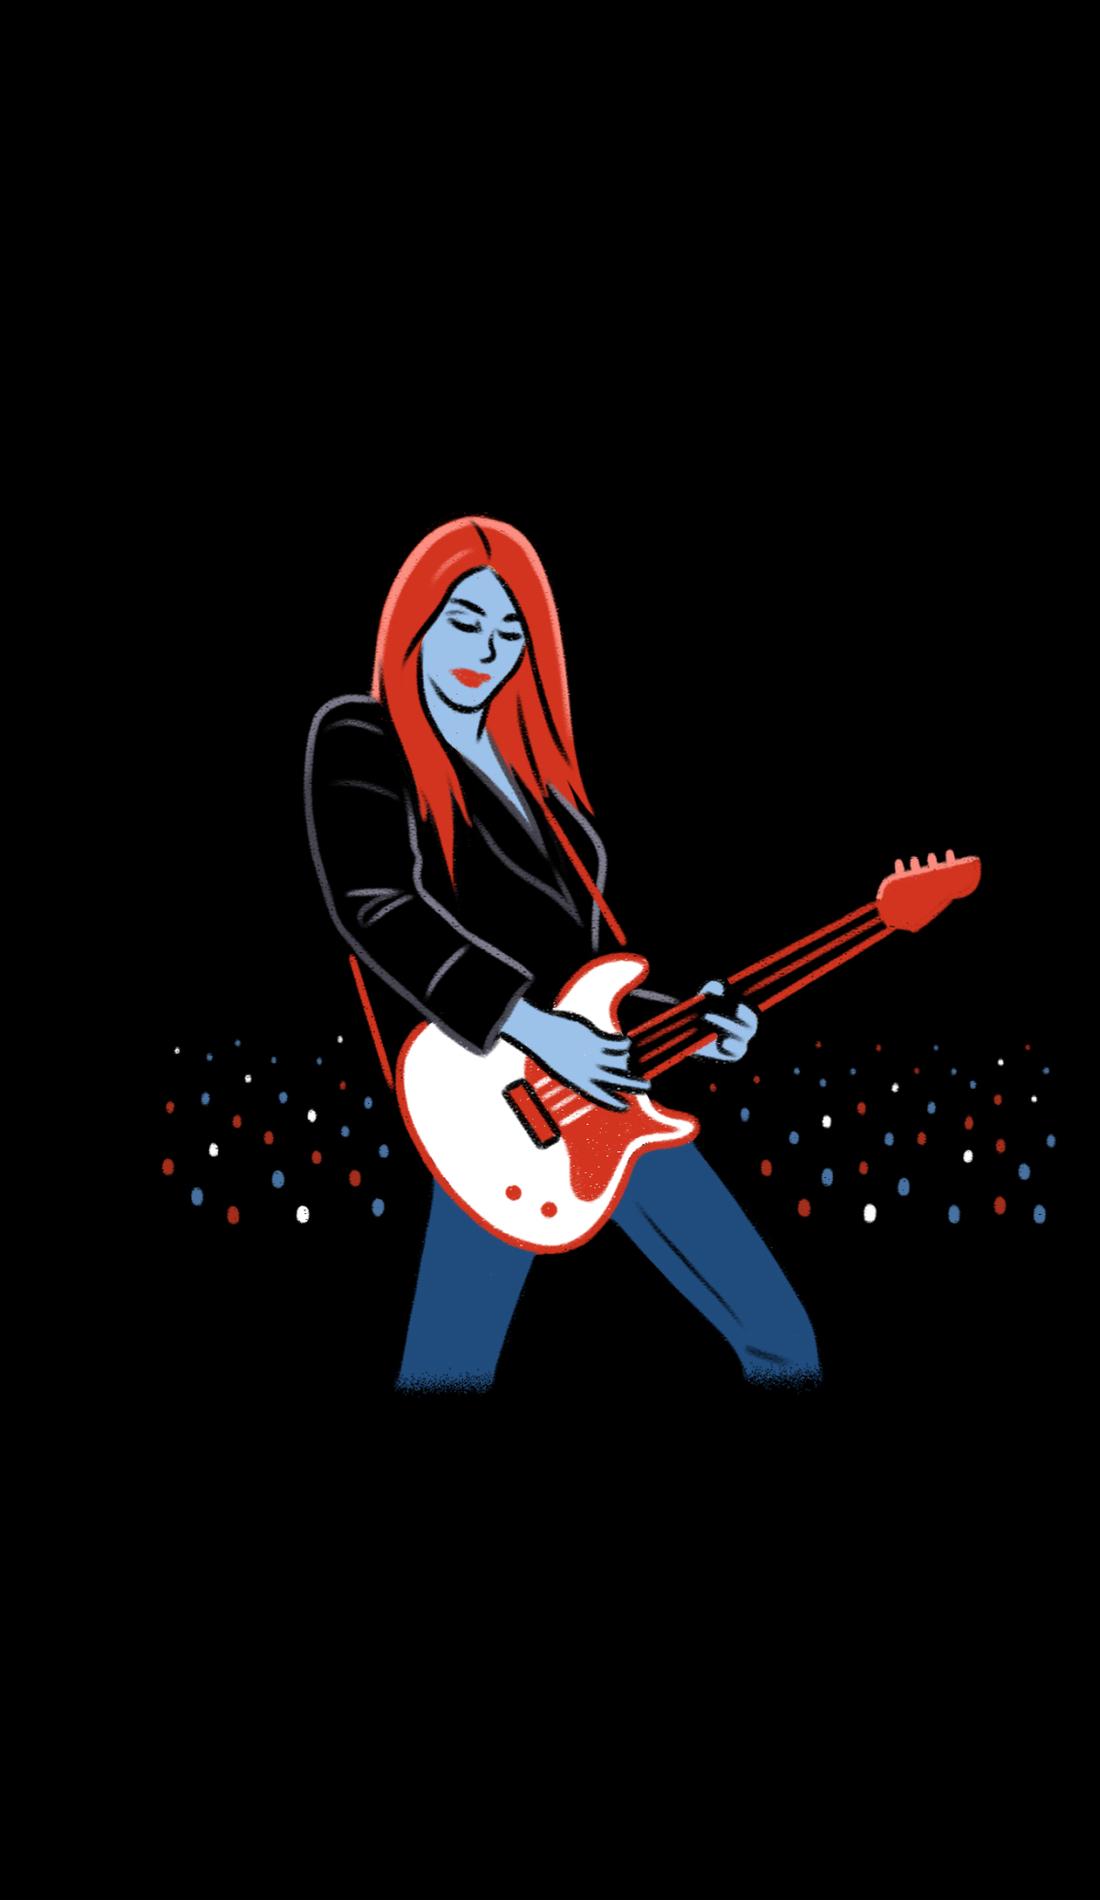 A Legends of Motown live event